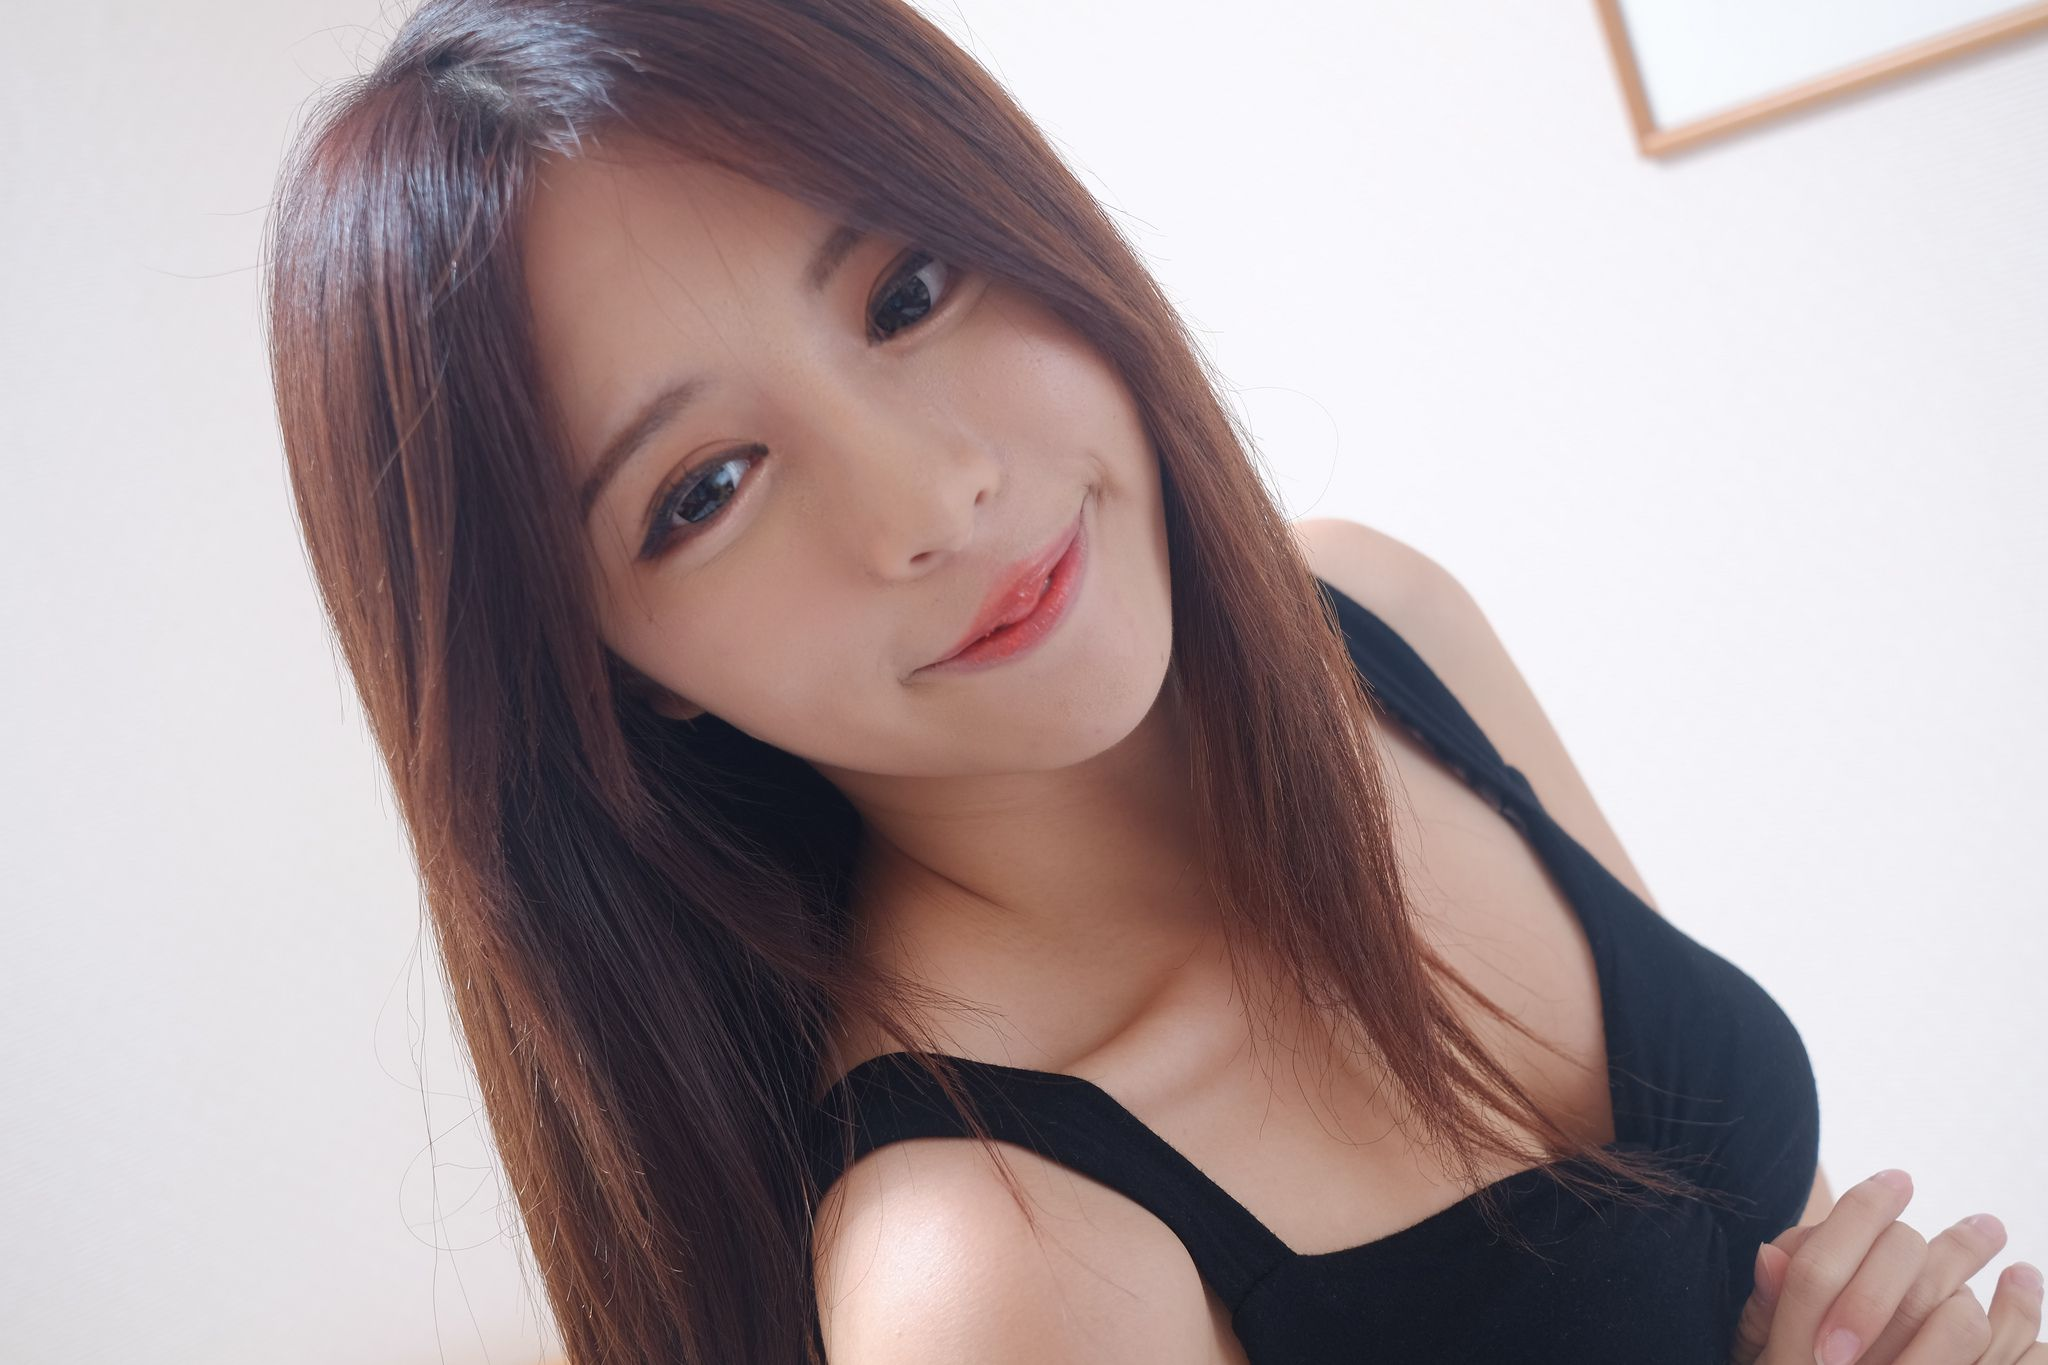 VOL.1058 [台湾正妹]妹子网红:张齐郡(Julie)高品质写真套图(63P)